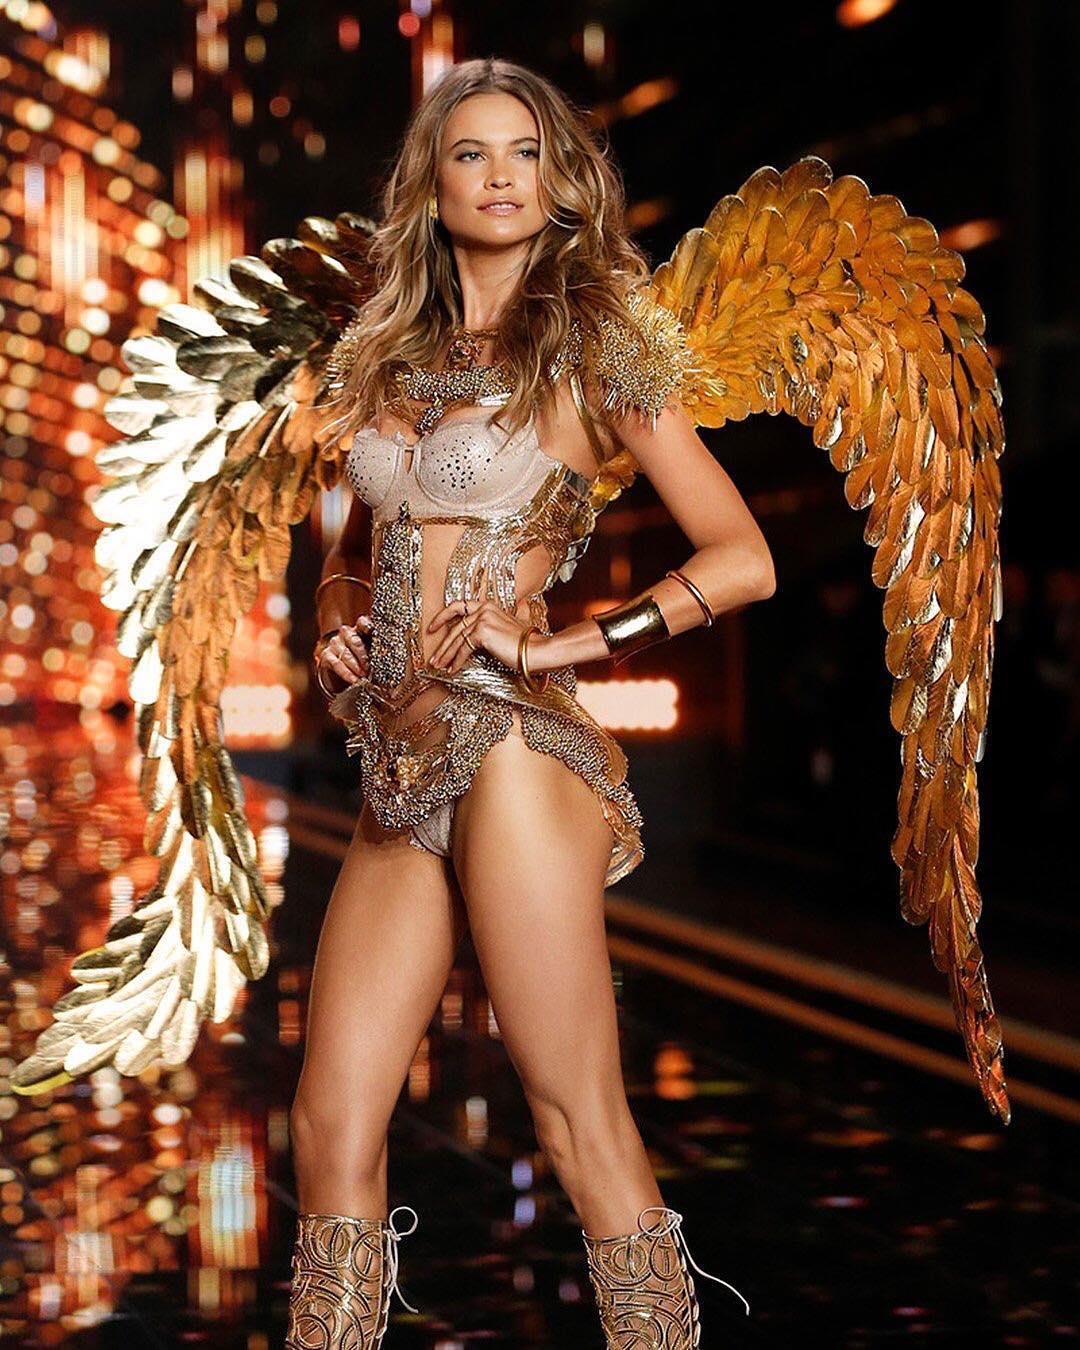 db94605f18 Photo  Victoria s Secret. Model Behati Prinsloo Levine announced she is  returning to ...